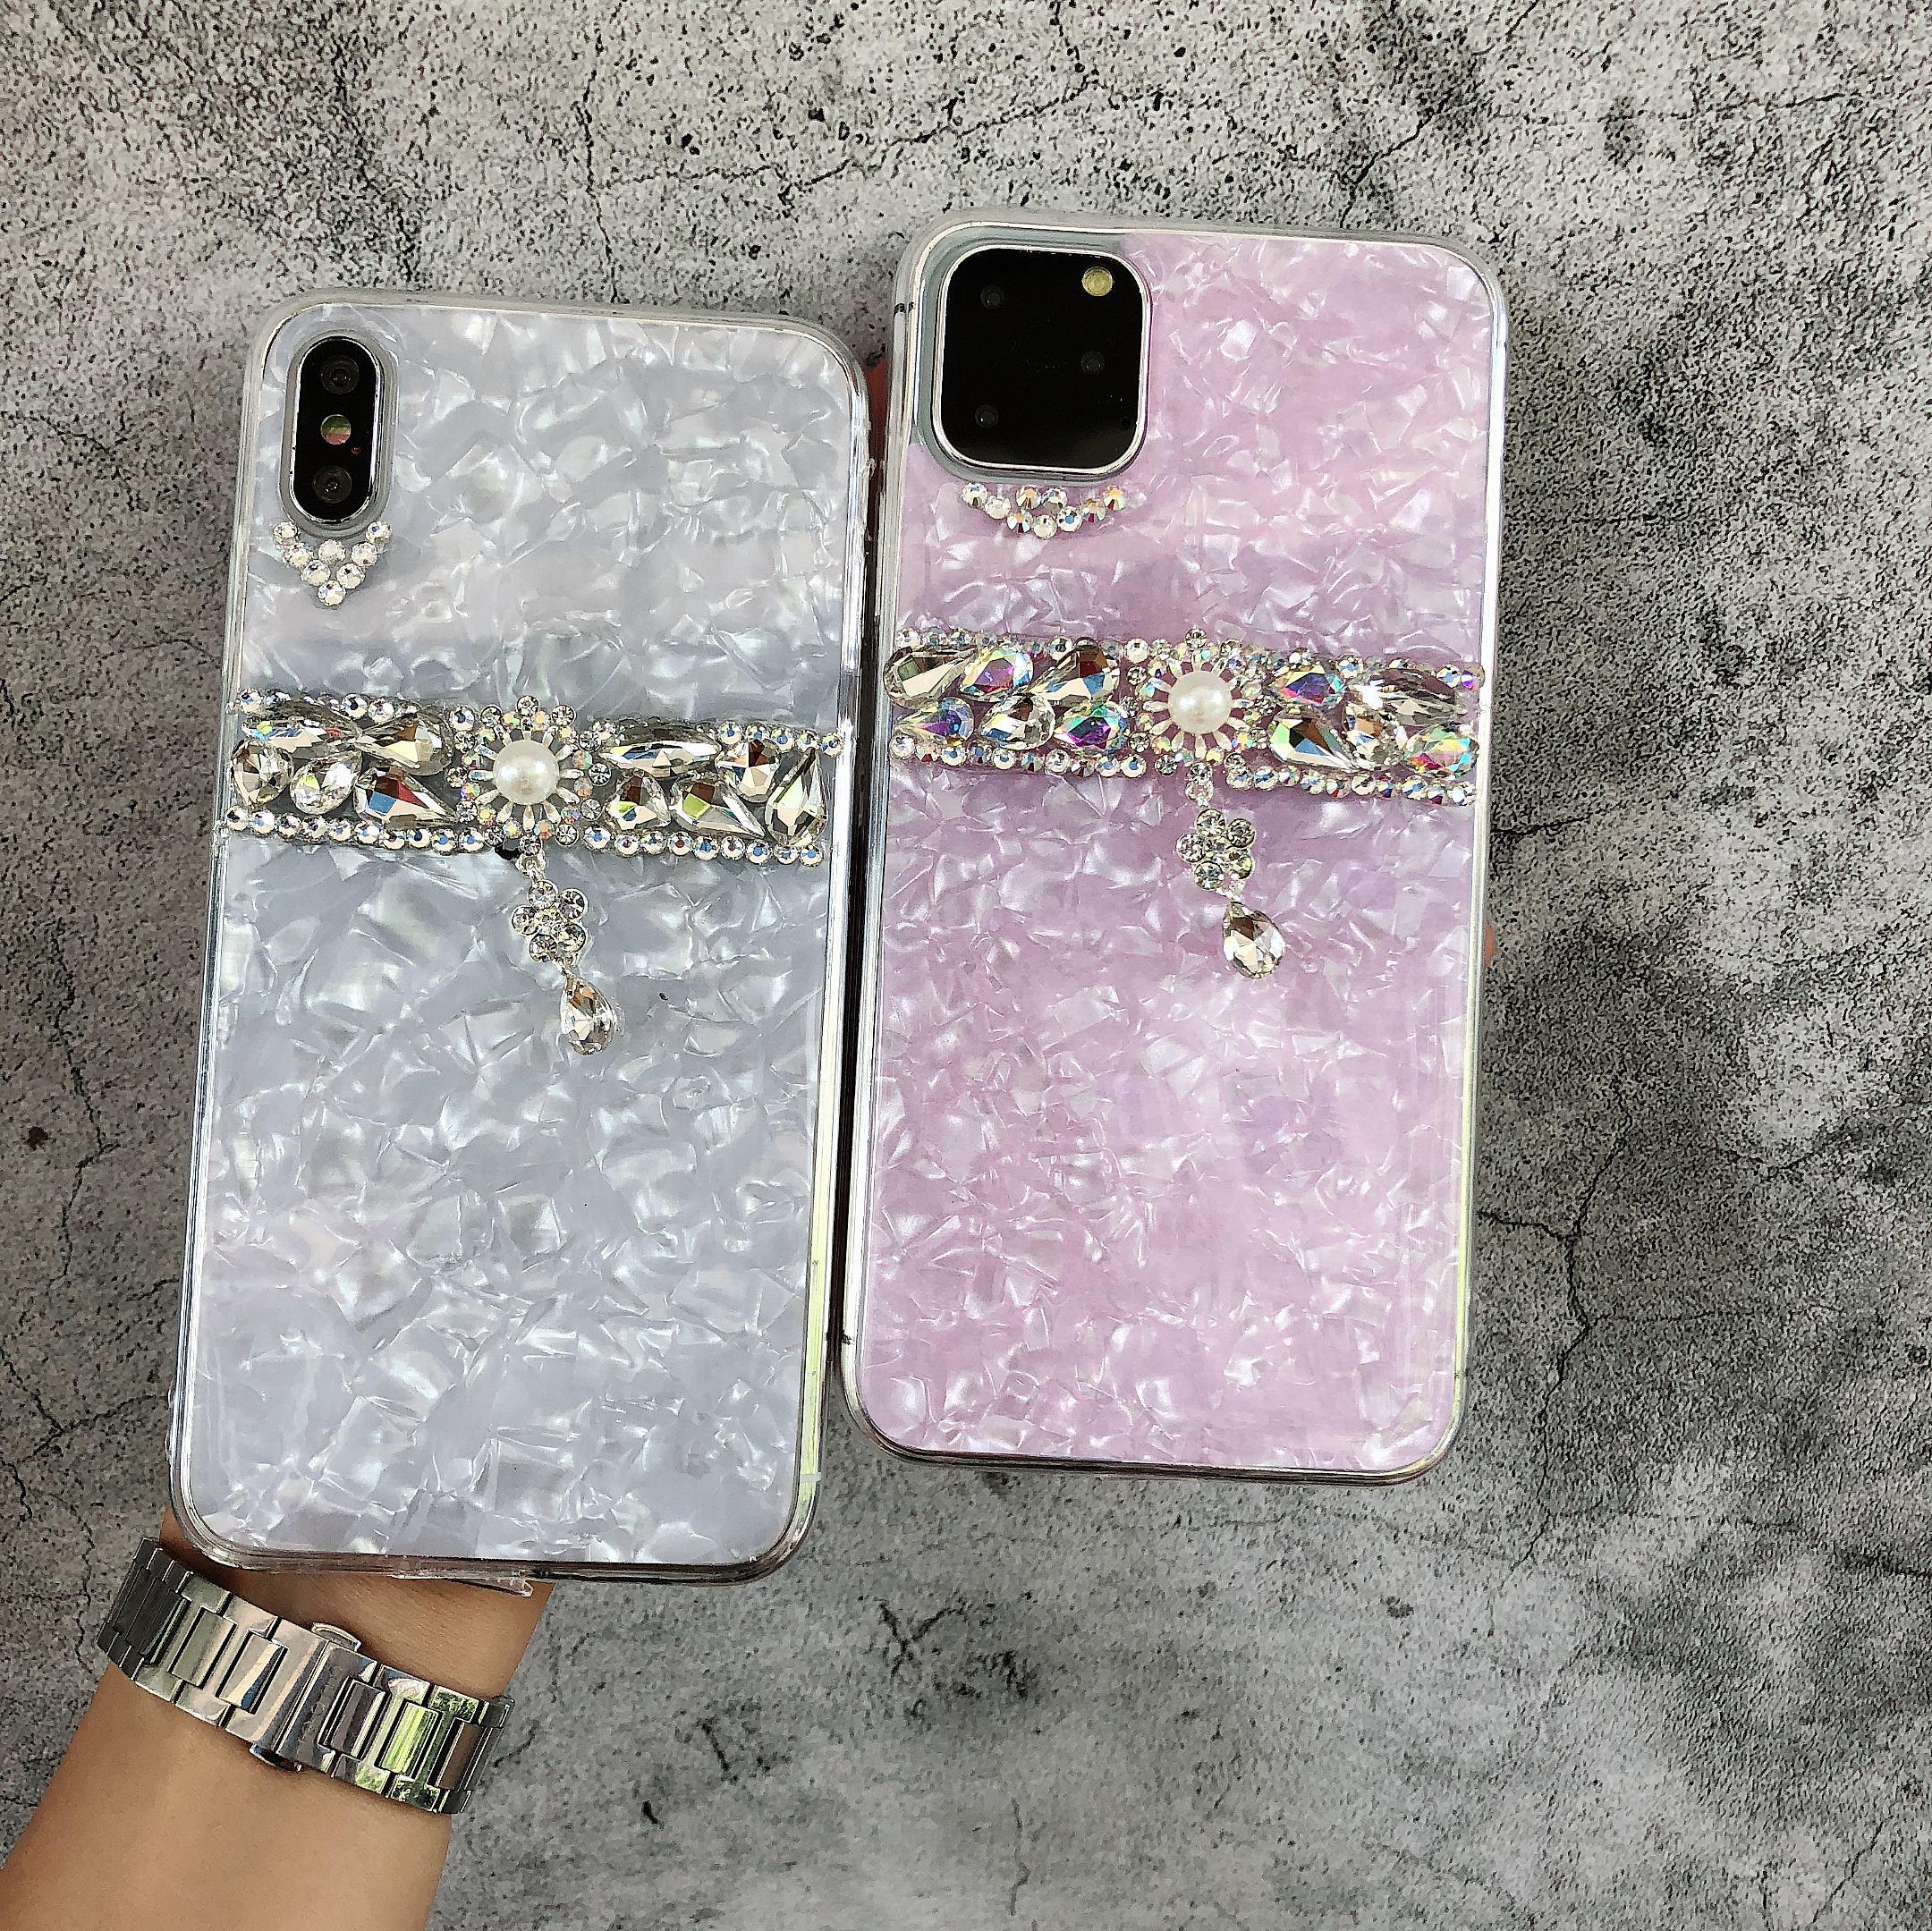 Tongkun Jungu iPhone 11 Pro Max iPhone XS iPhone XR iPhone 8 Marble Cubic Ring Case